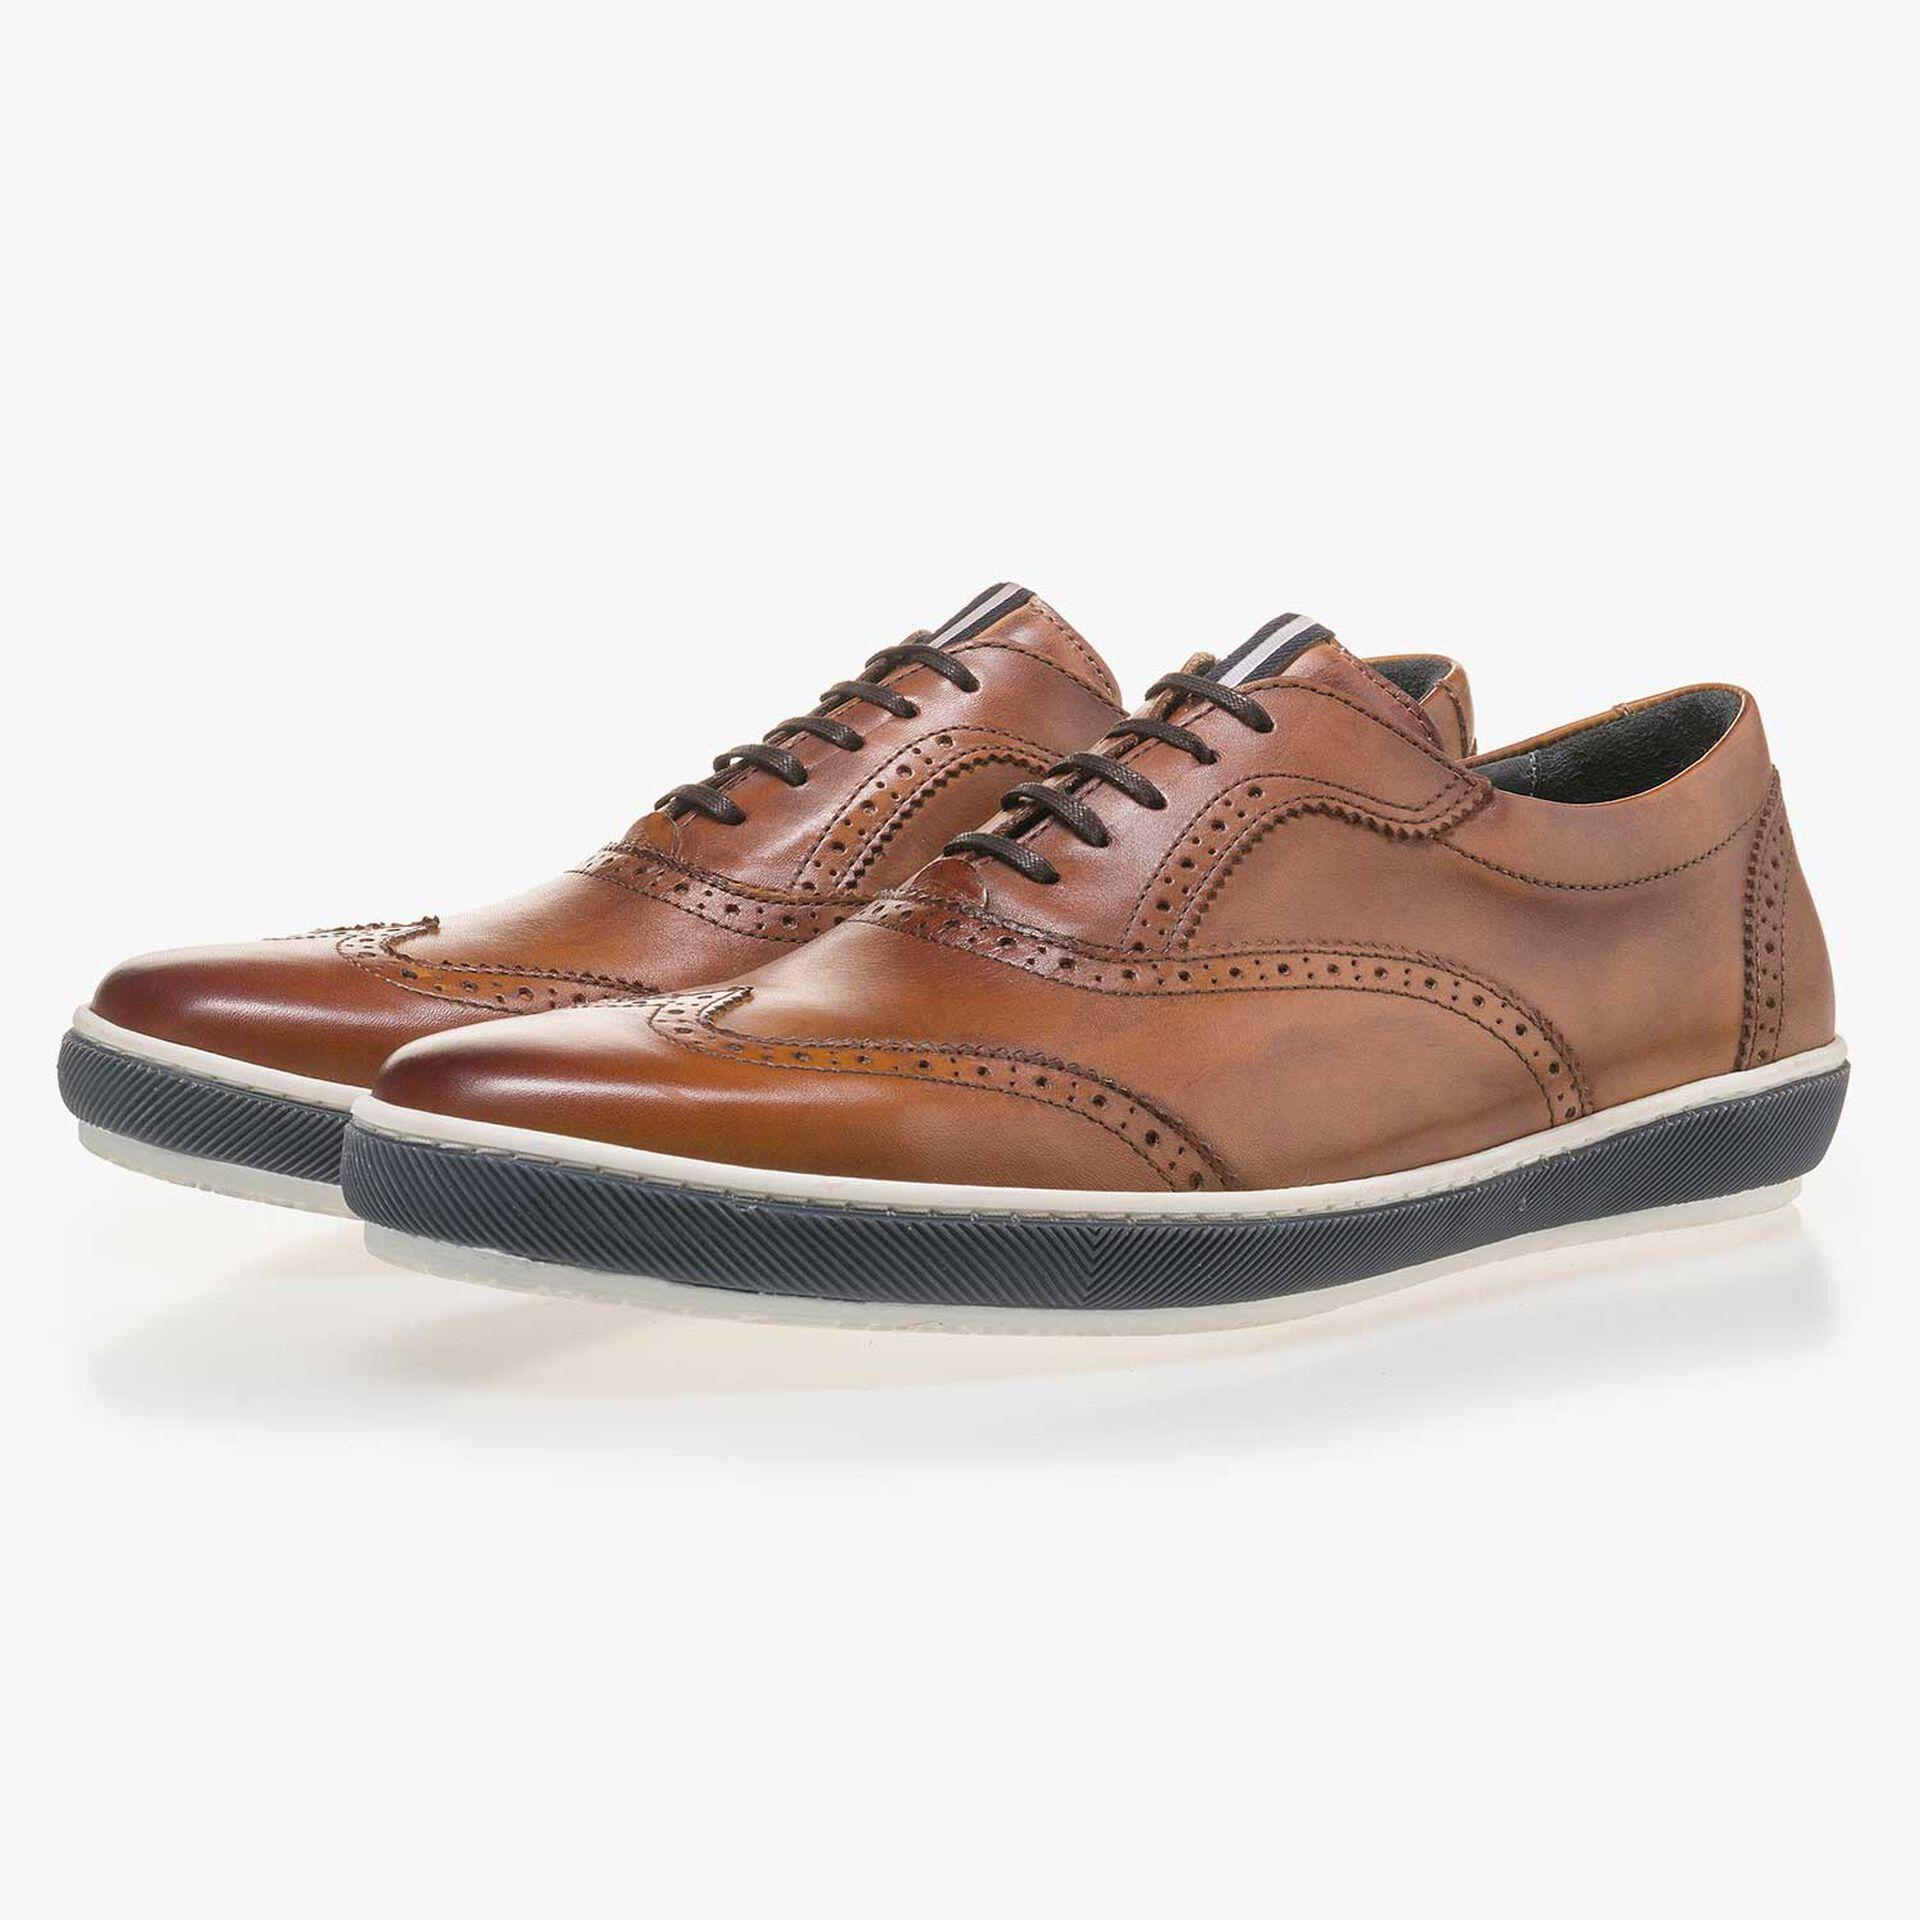 Cognac-coloured brogue leather sneaker